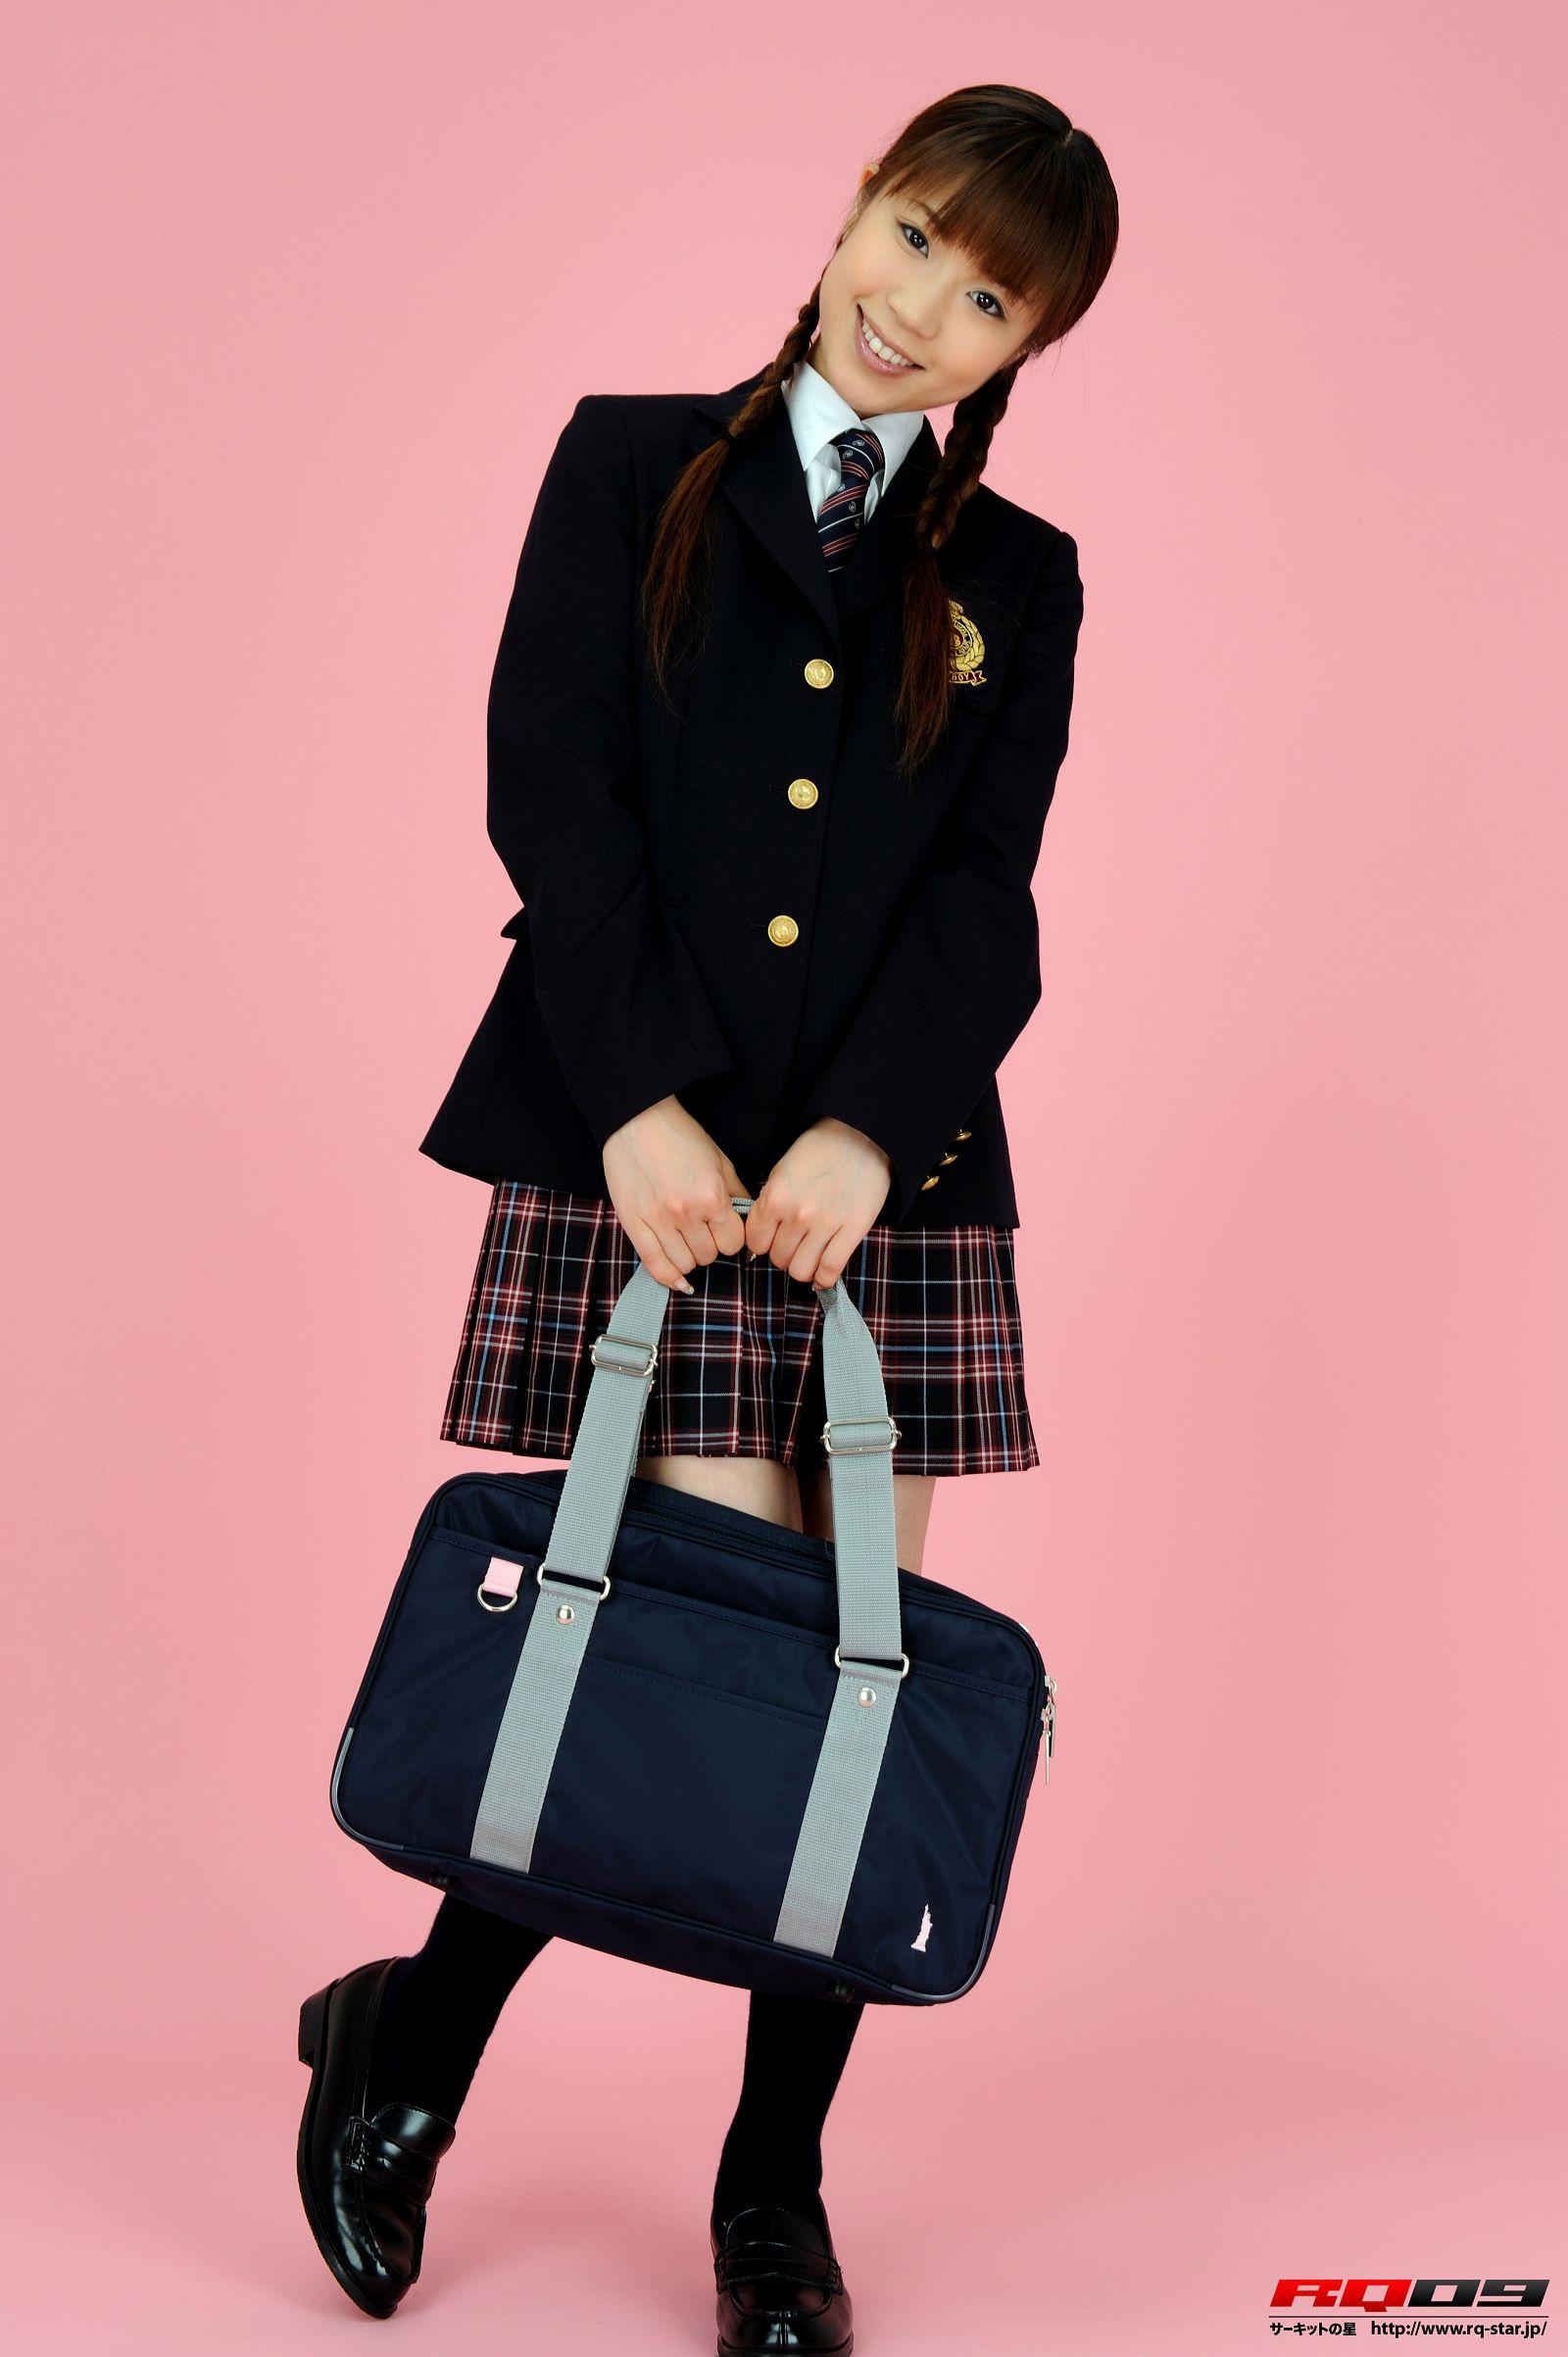 [RQ-STAR美女] NO.0163 Yuko Momokawa 桃川祐子 Student Style0